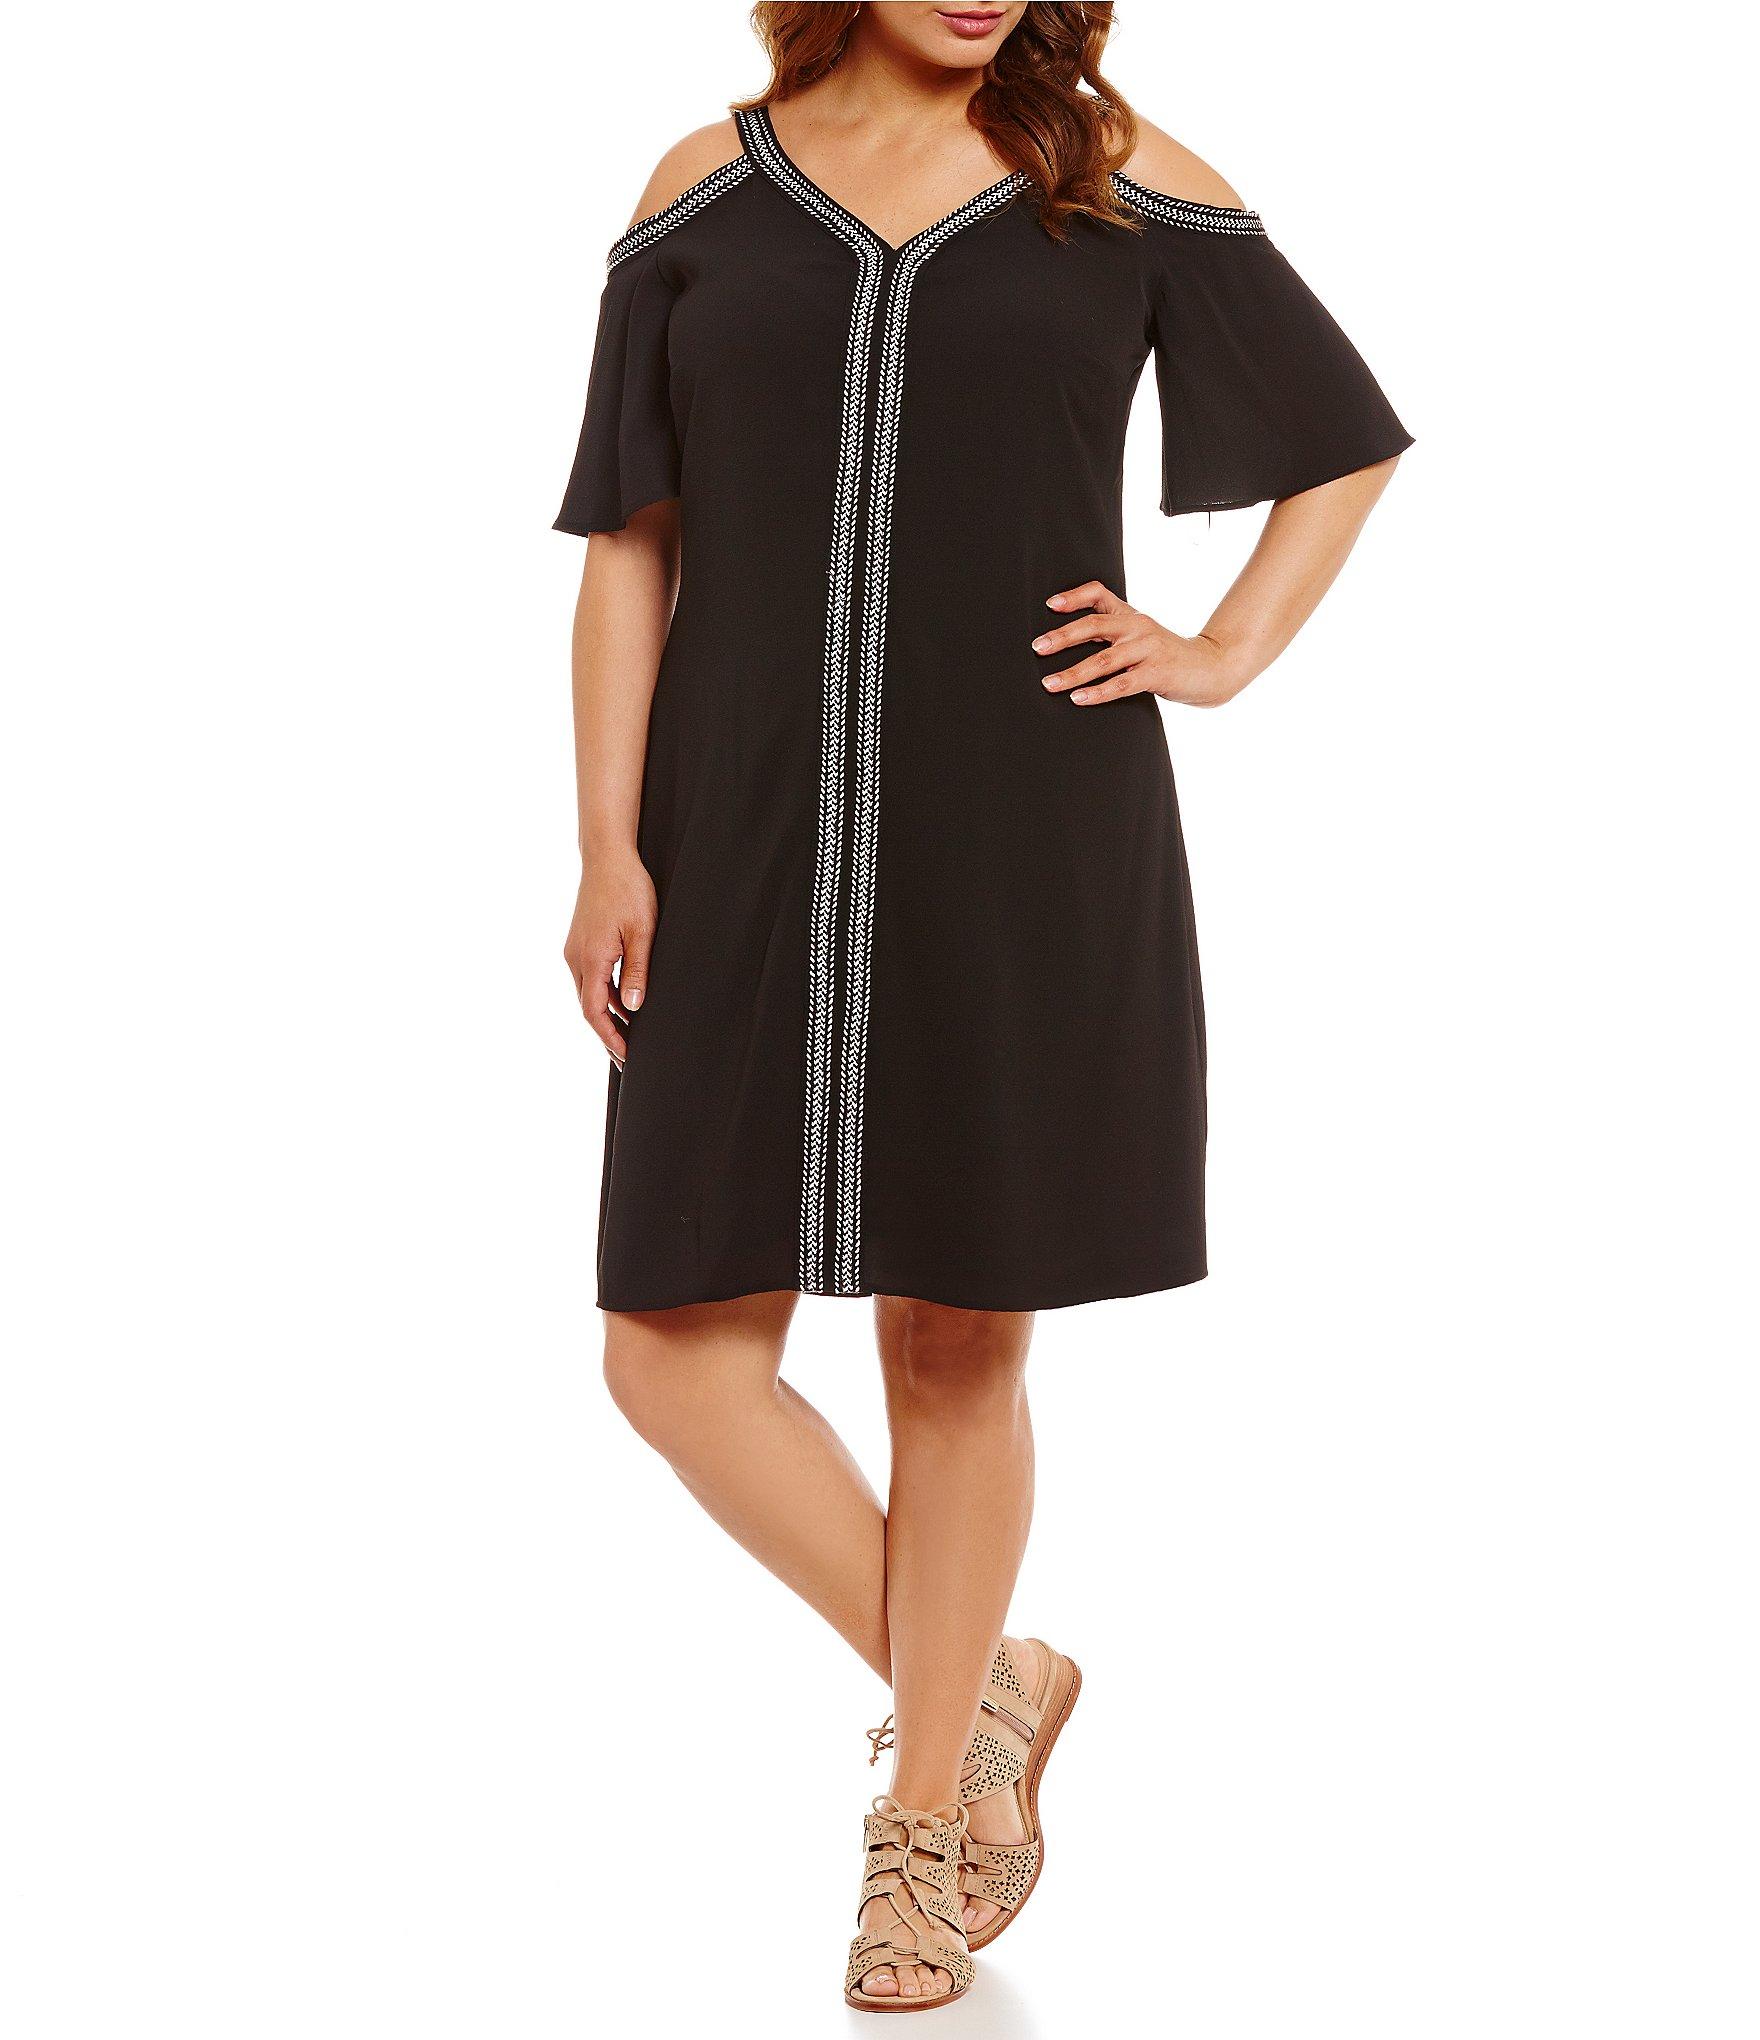 clearance dresses: Women\'s Plus-Size Clothing   Dillards.com